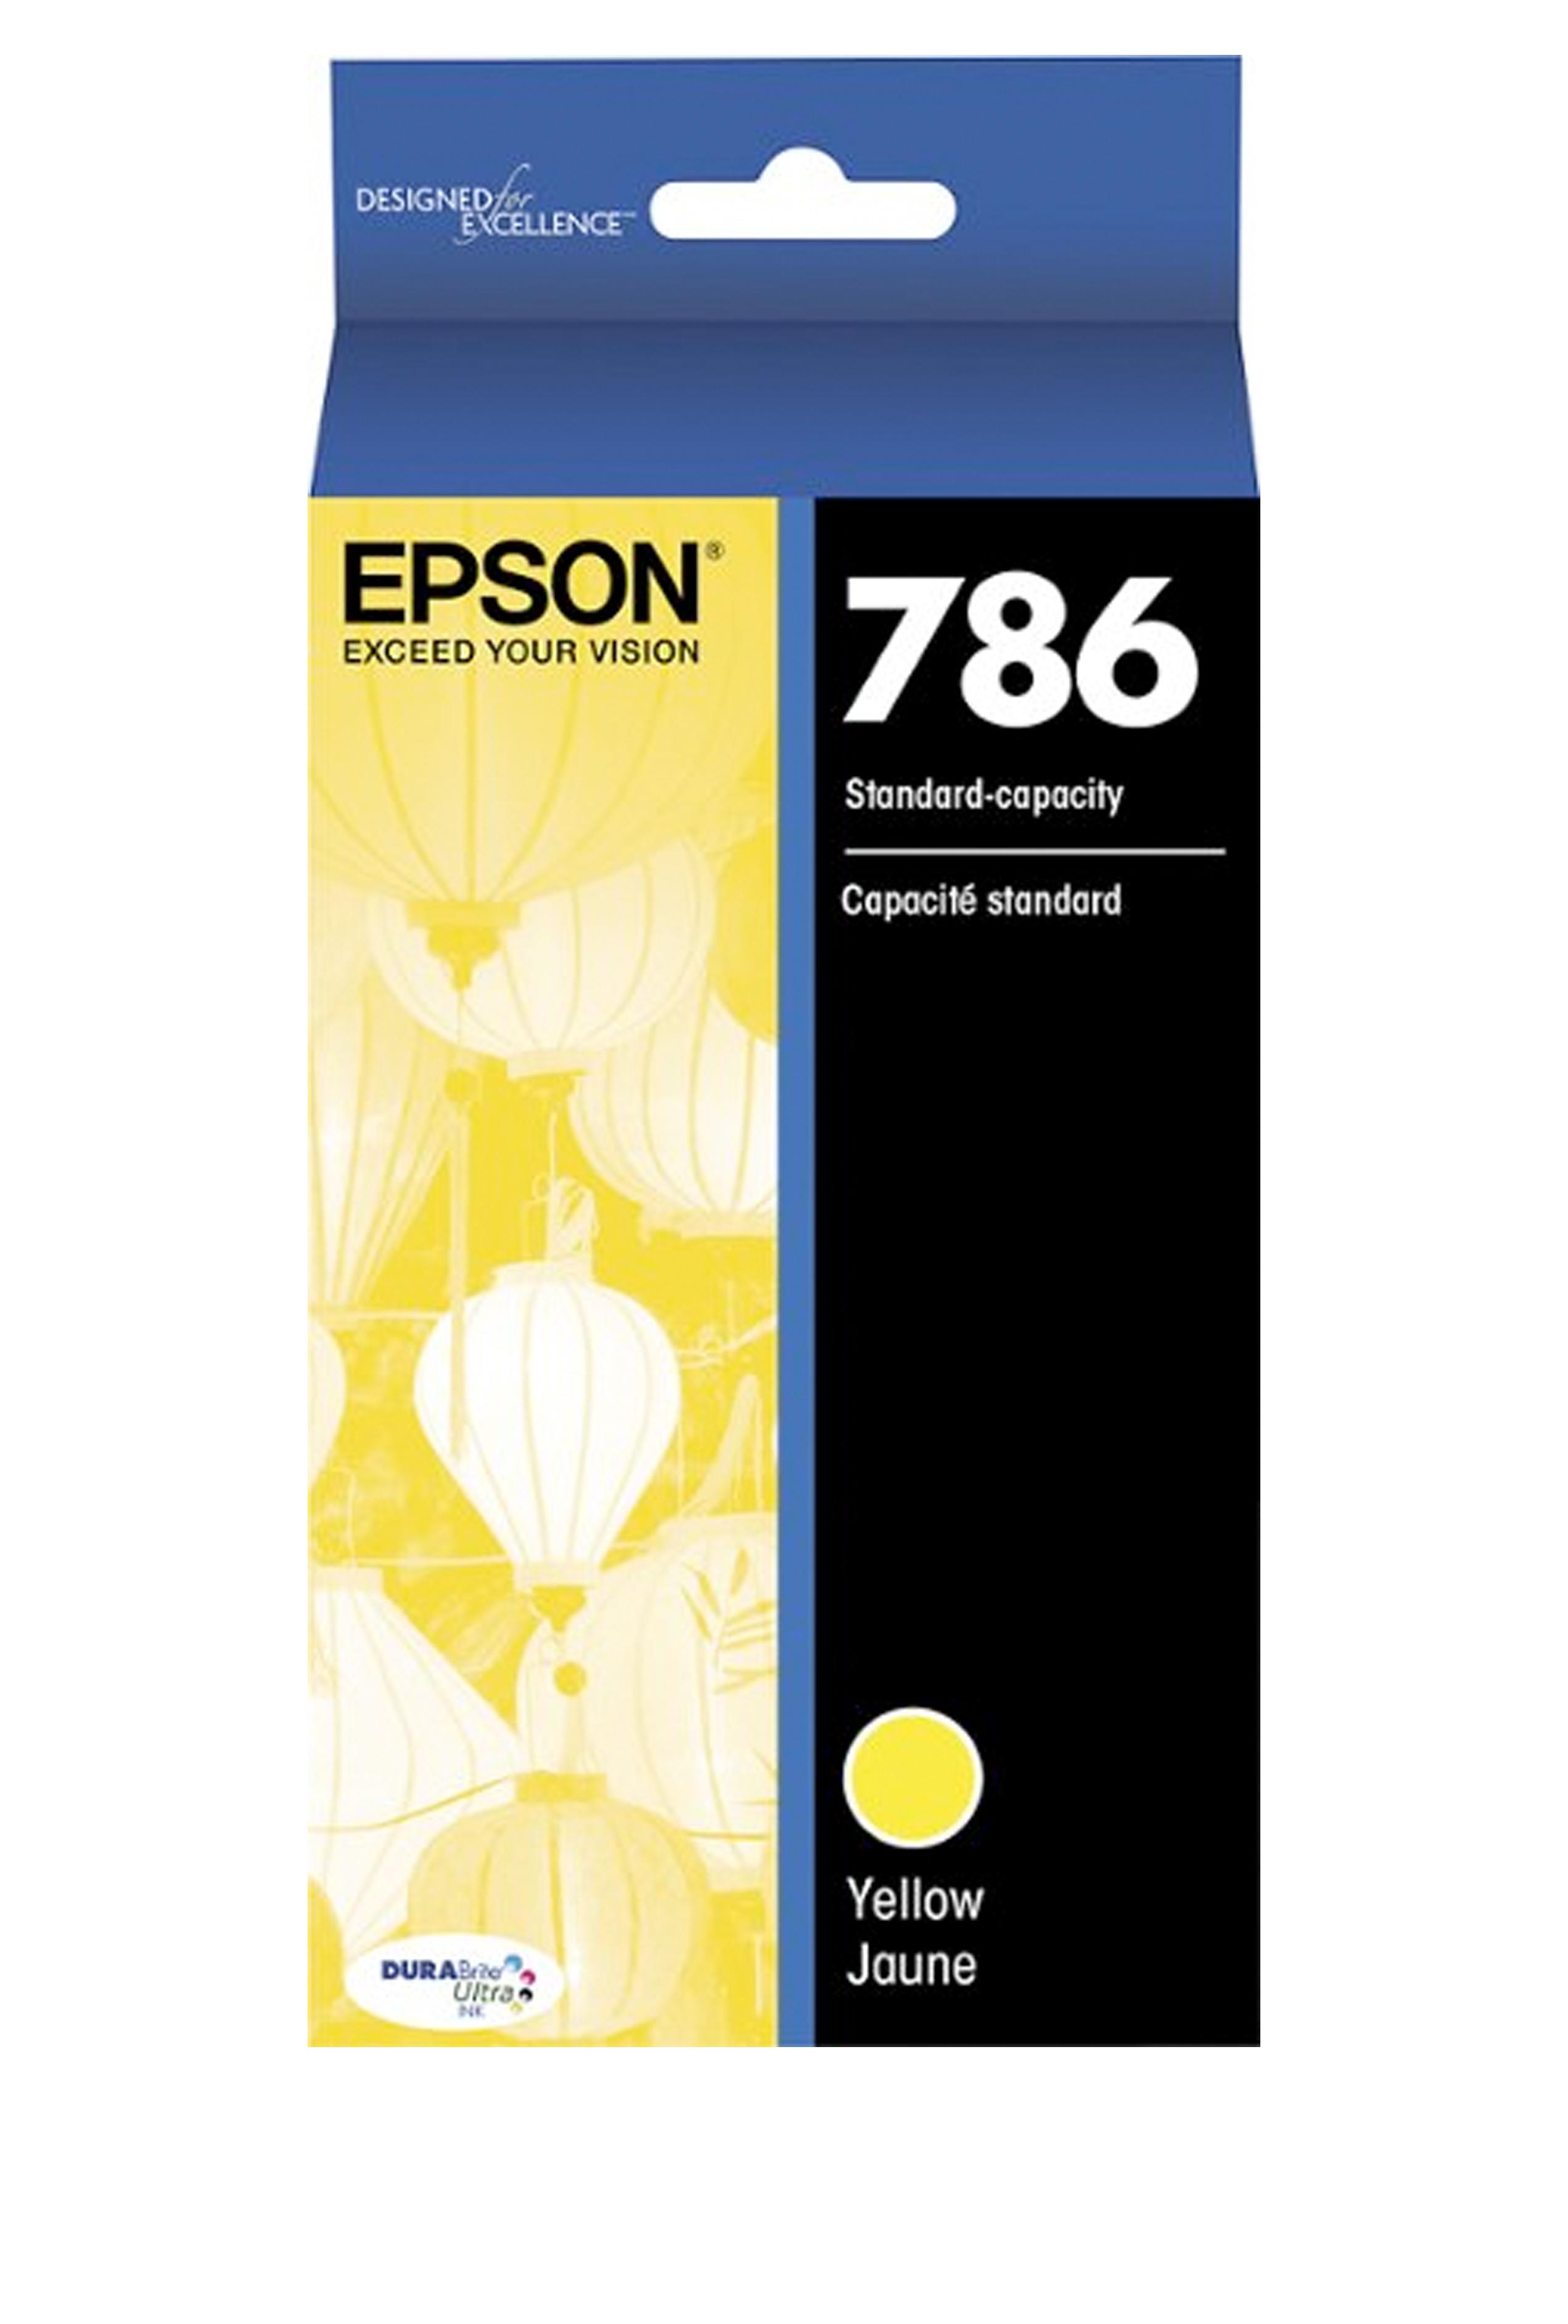 Epson 786, Yellow Ink Cartridge (T786420-S)